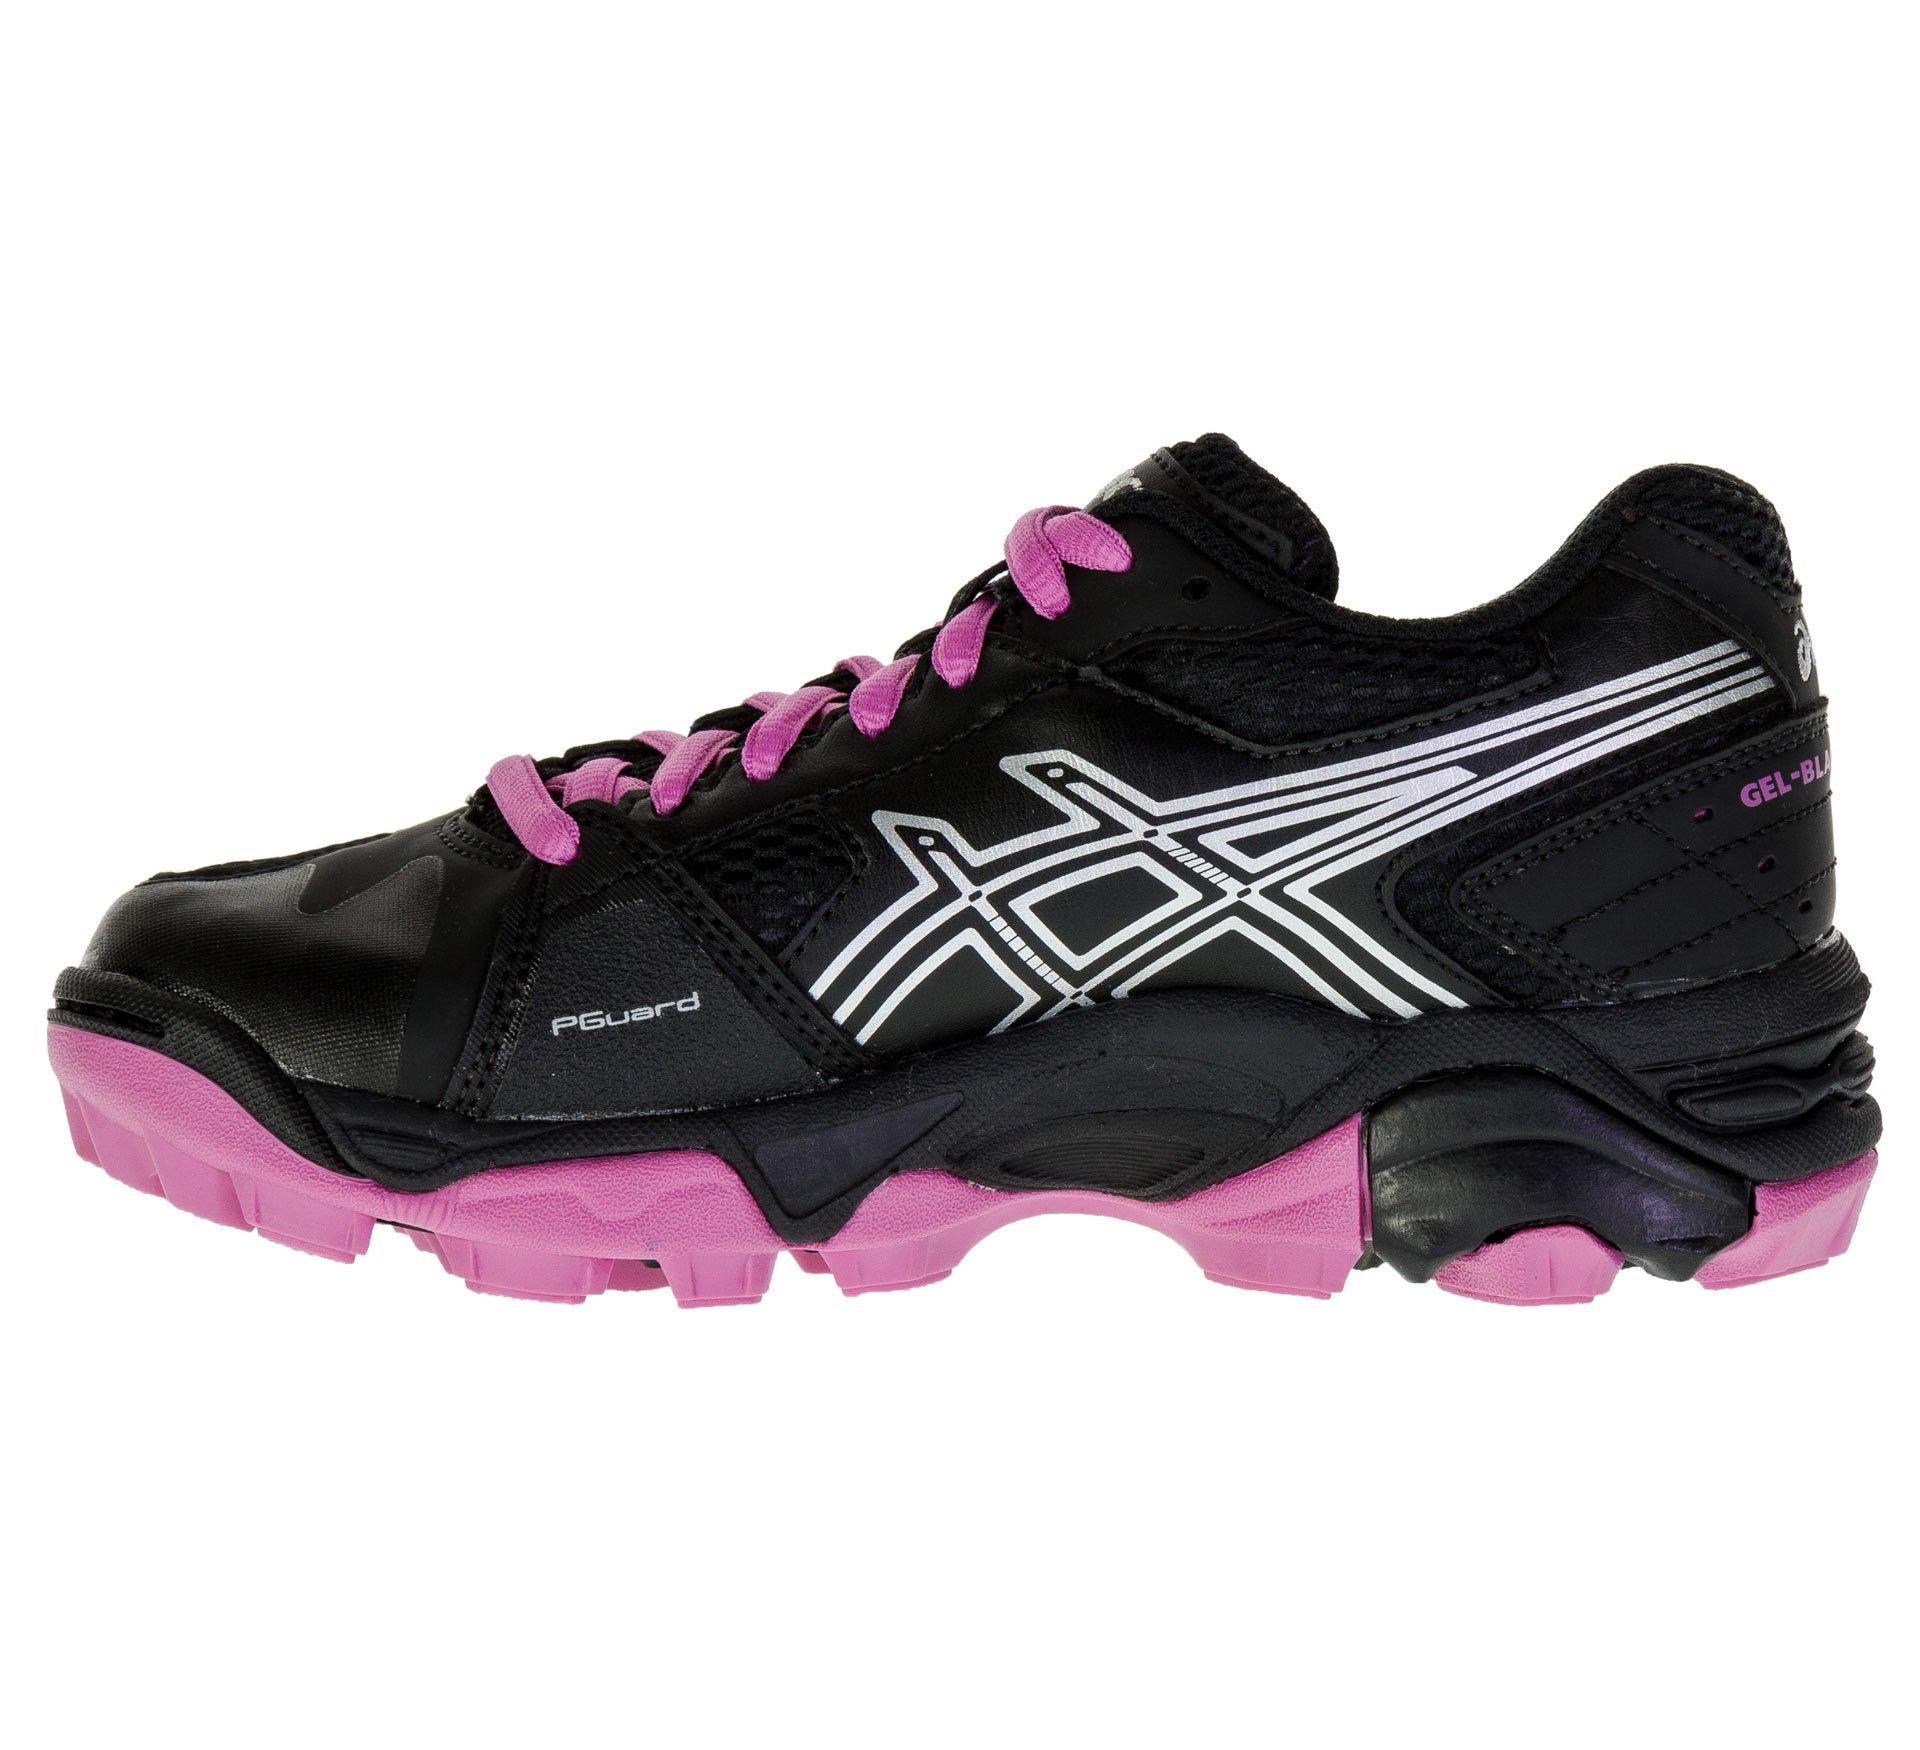 ASICS Gel Blackheath 4 GS Junior Hockey Shoes